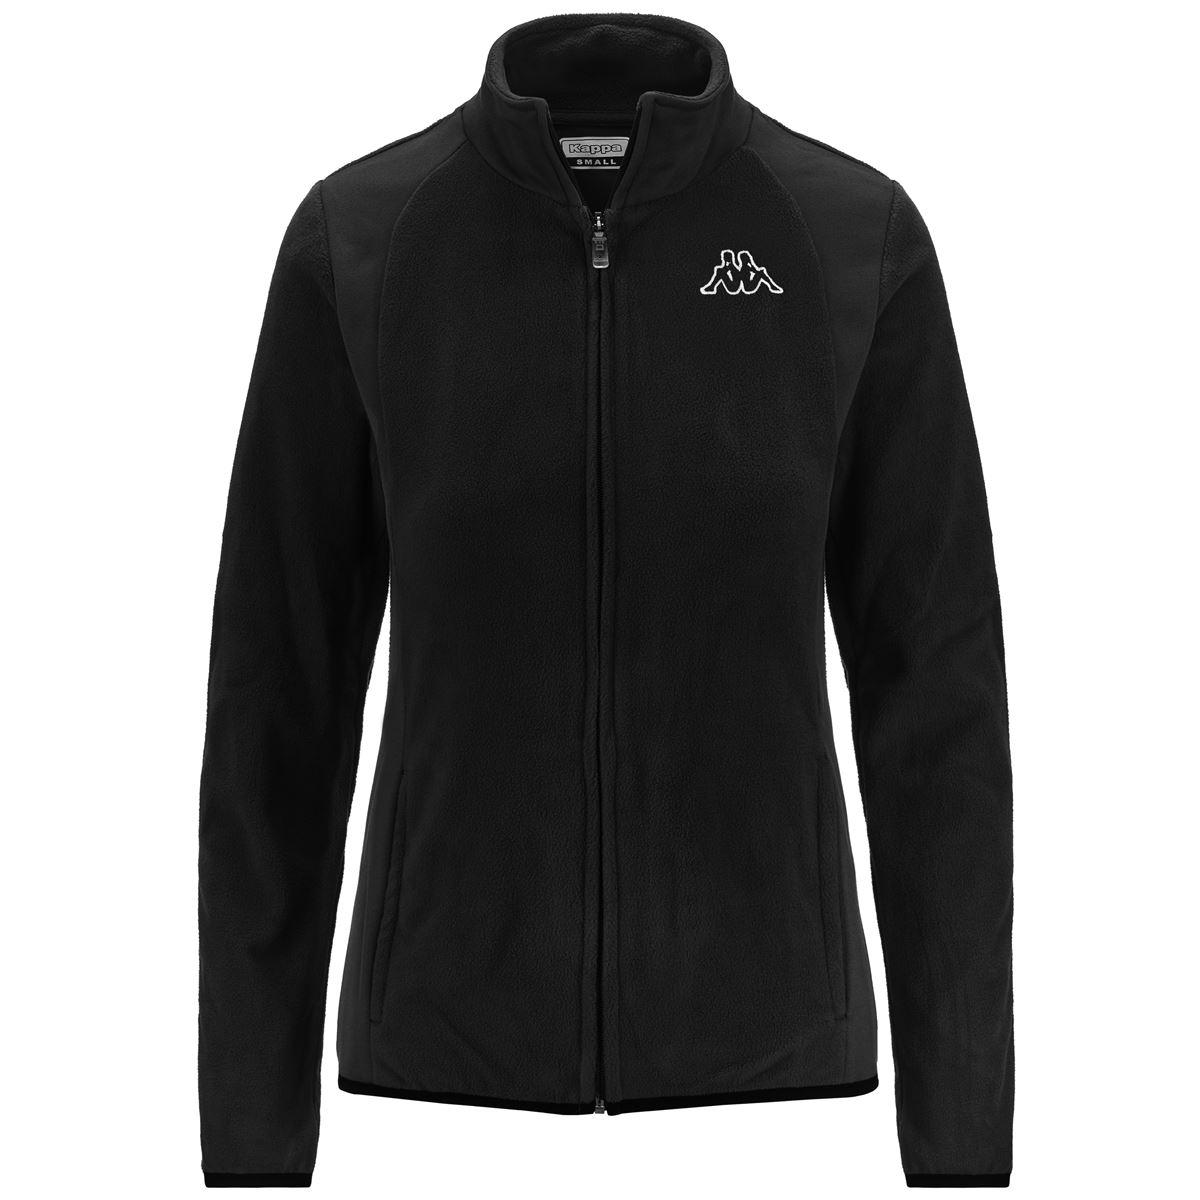 Kappa Fleece Sweater Woman LOGO VAVAUX Training Jacket SLIM FIT